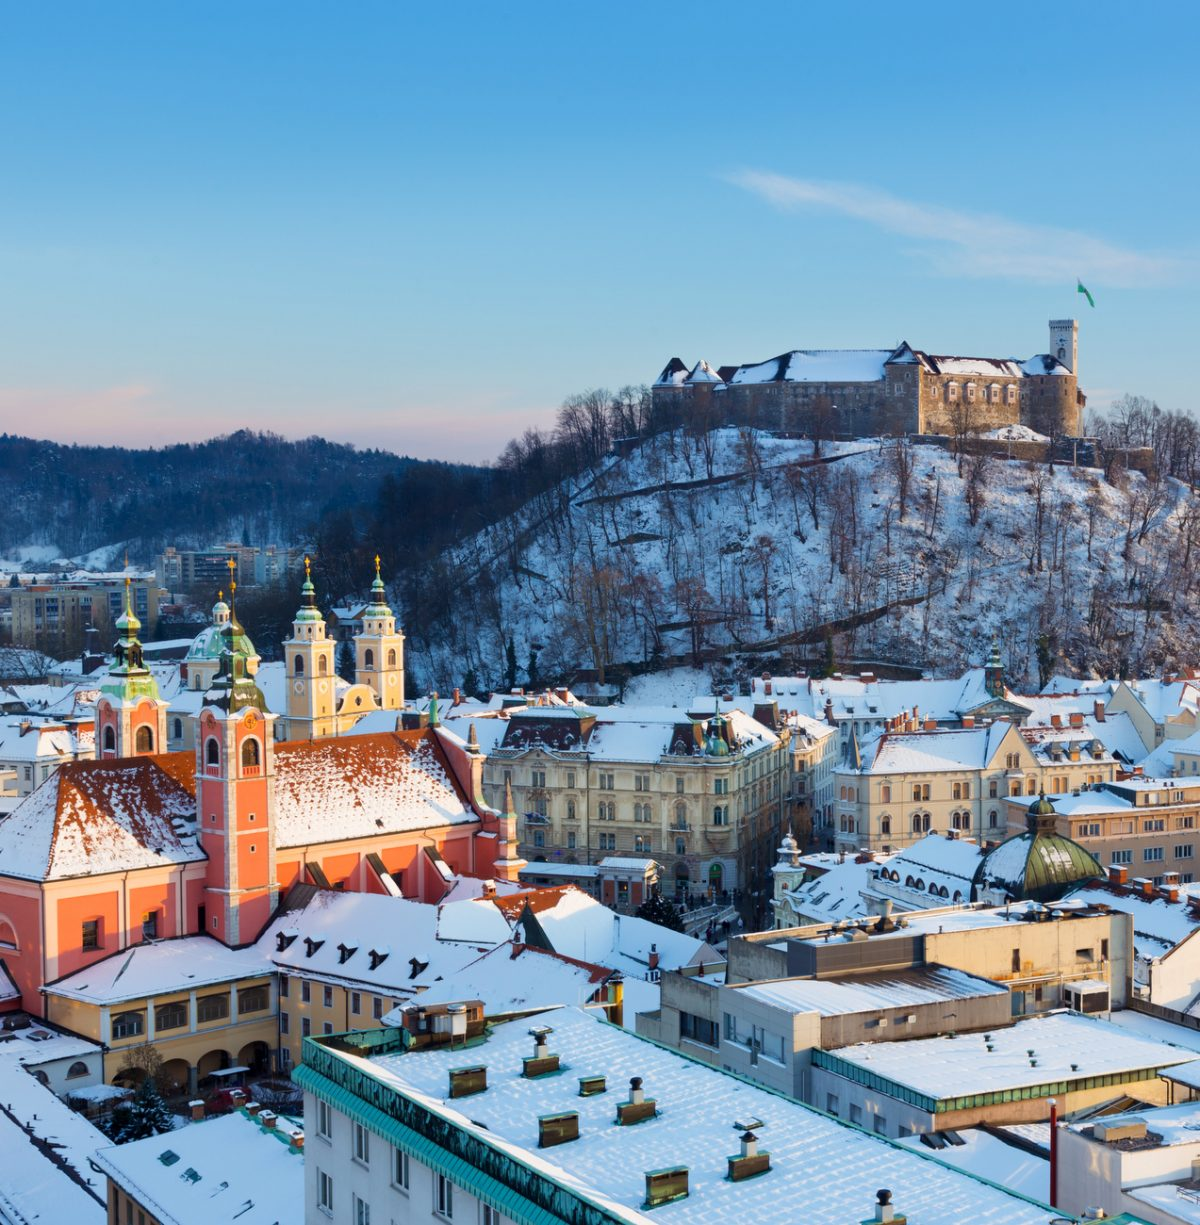 Winter vacation ideas in Ljubljana